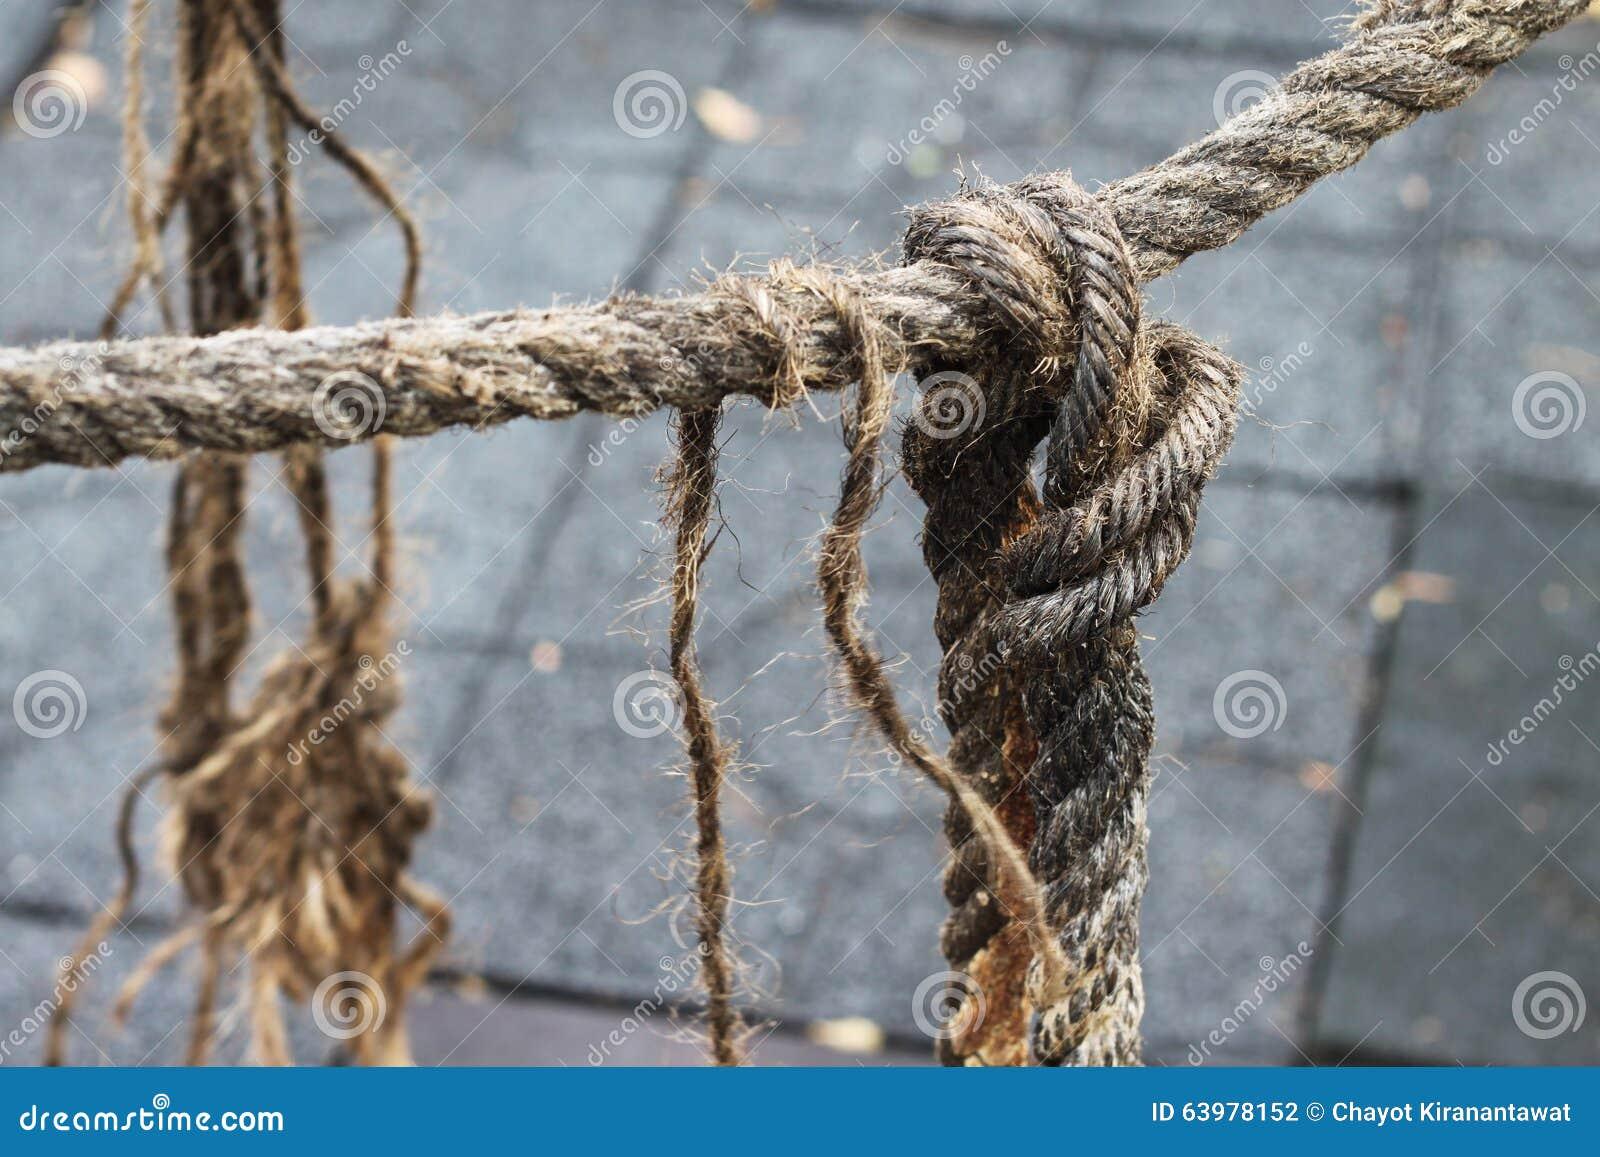 La corda allenta il nodo